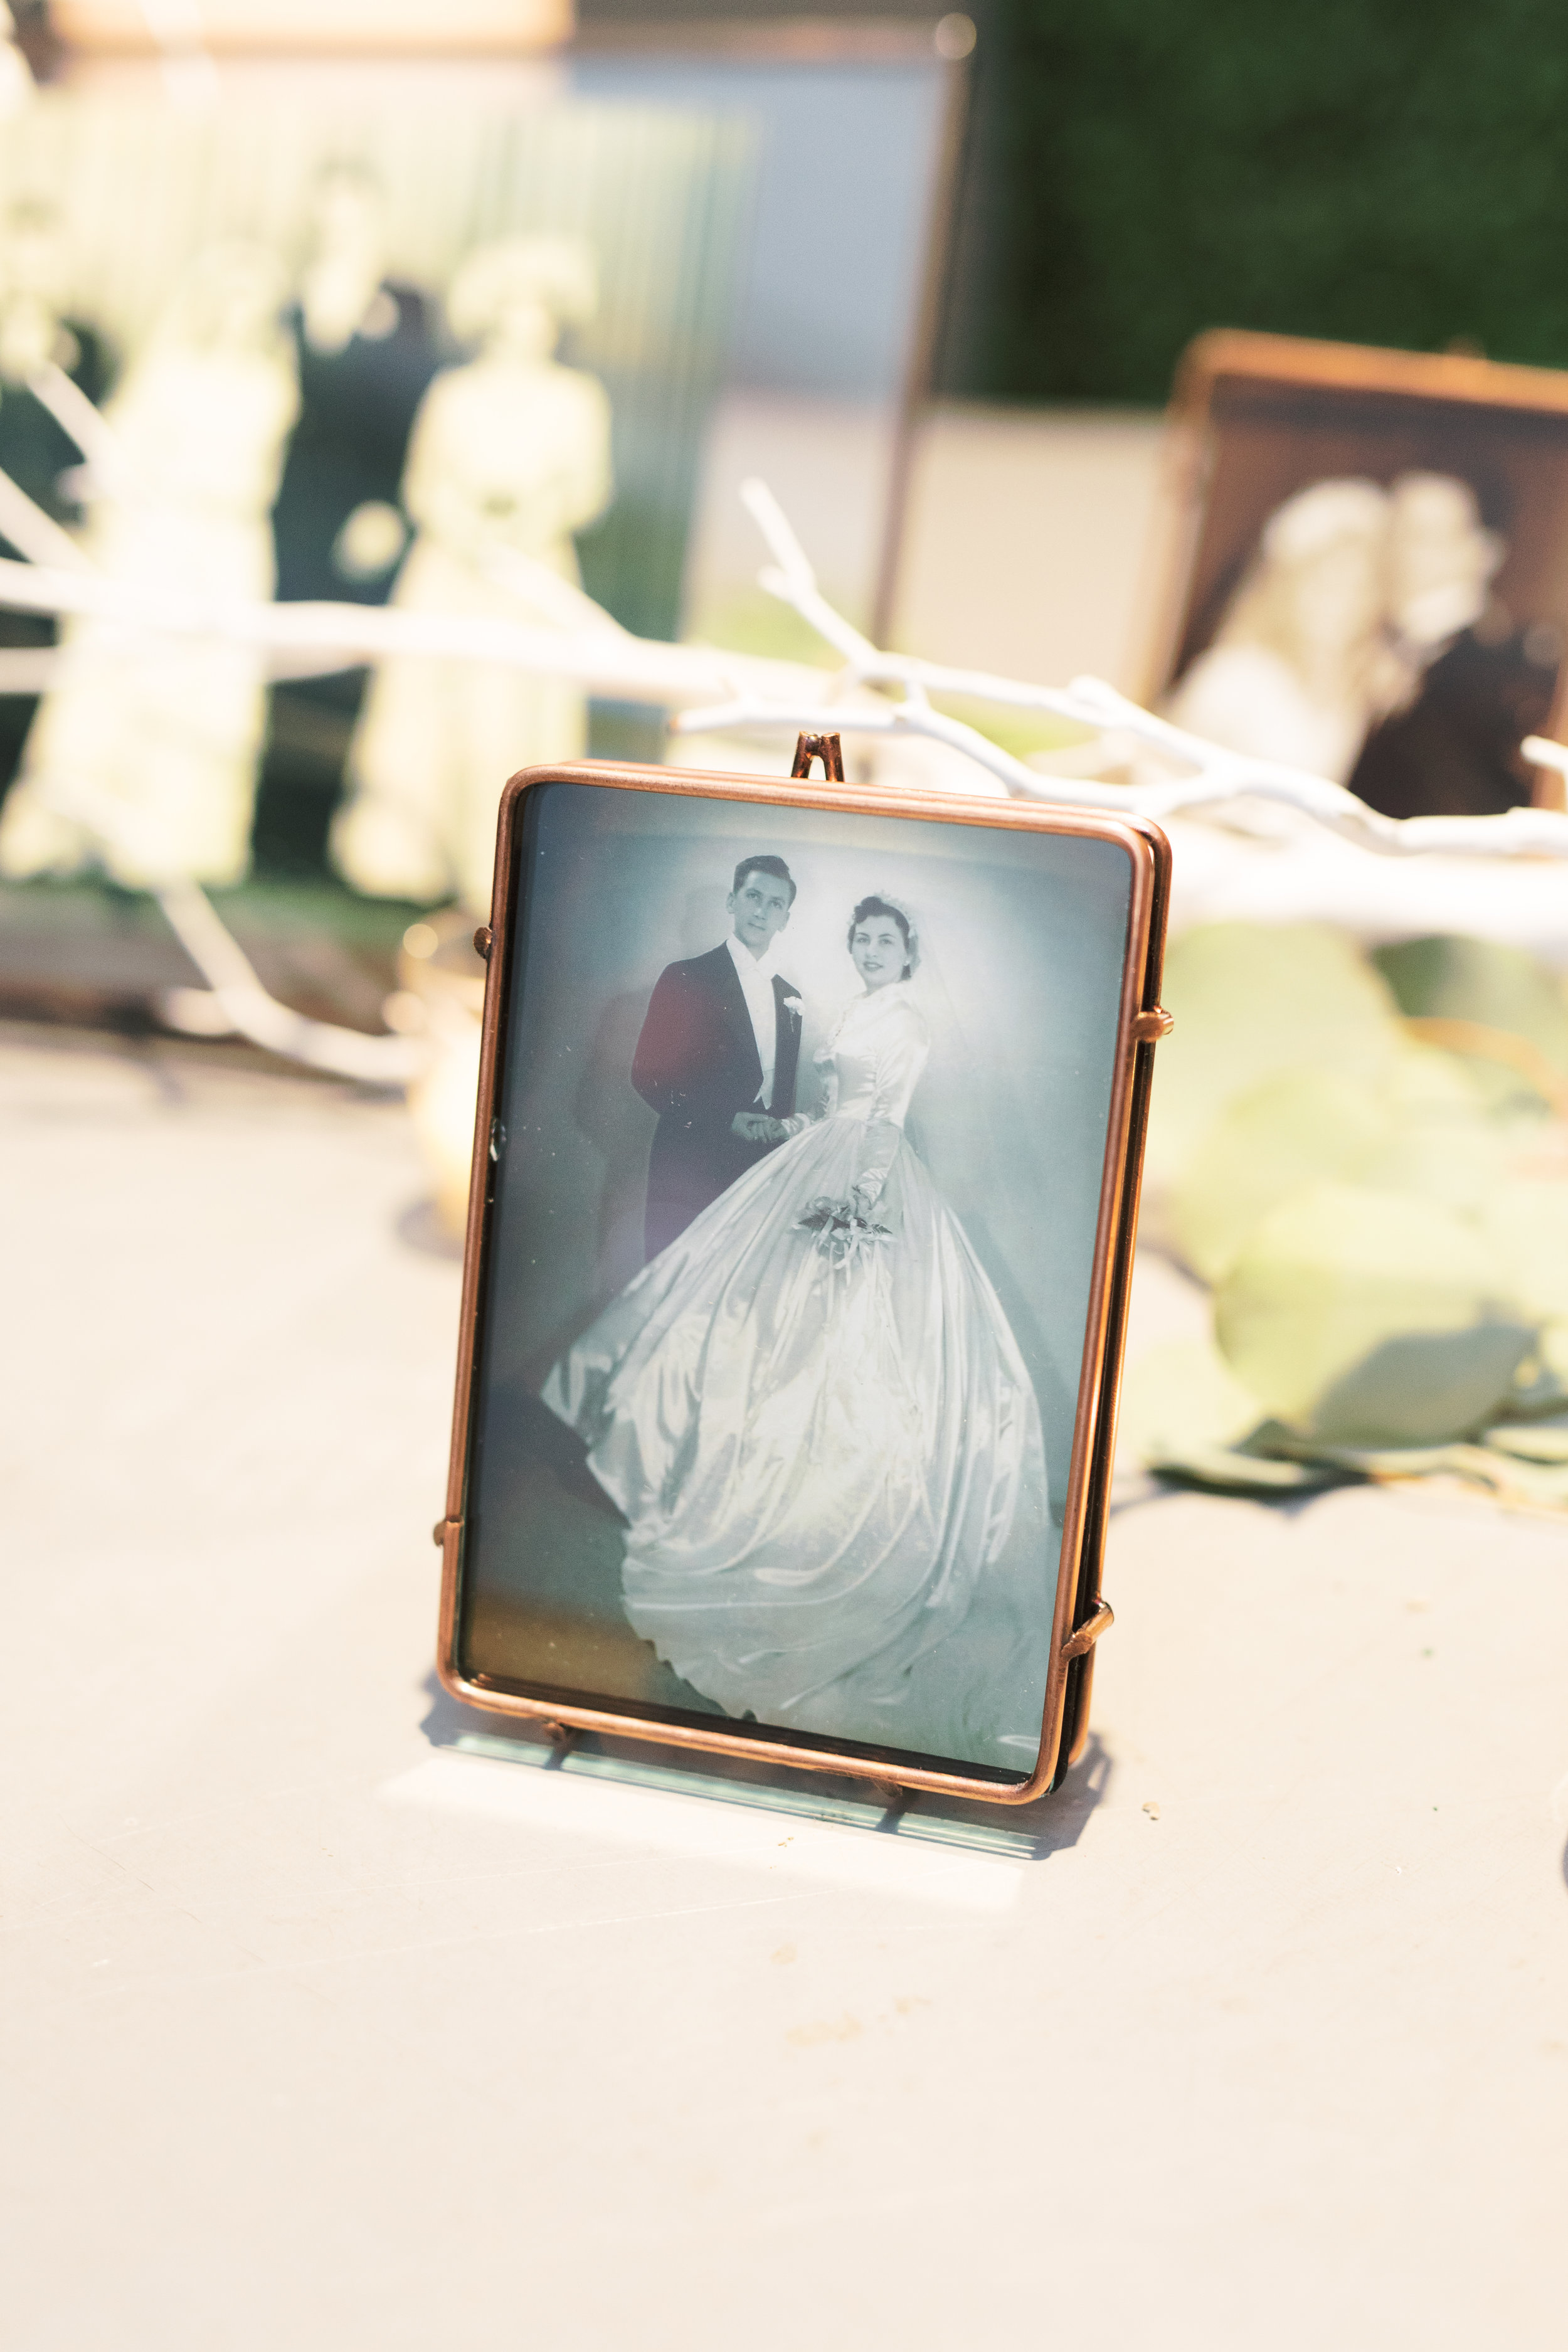 haley-richter-photography-keristin-wedding-philadelphia-fame-same-sex-grooms-classic-fun-drag-show-123.jpg